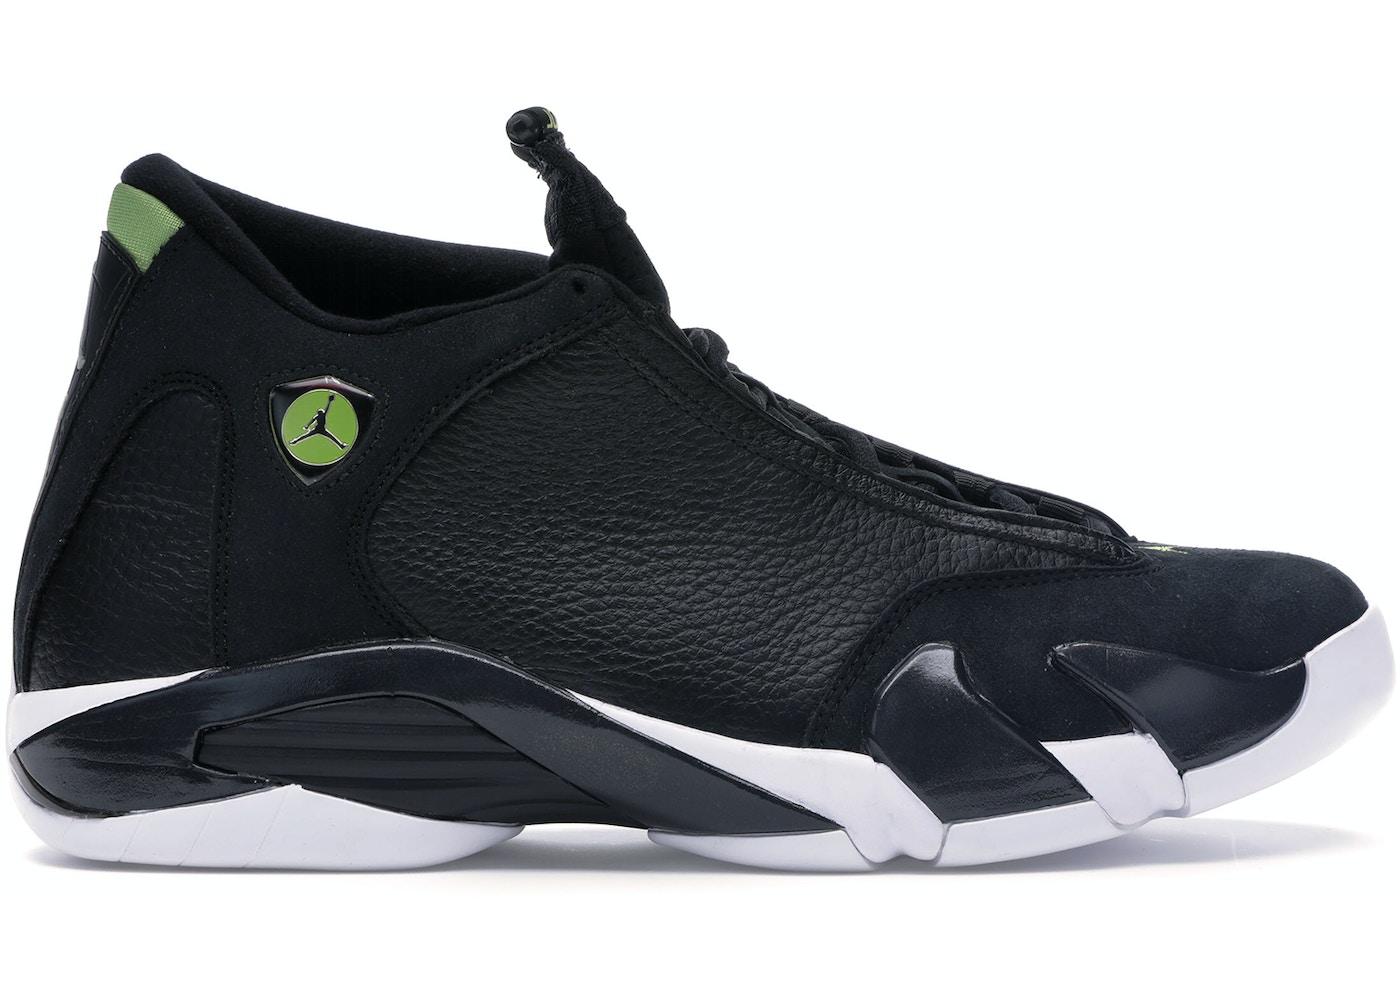 separation shoes 21ae9 30931 Jordan 14 Retro Indiglo (2016)